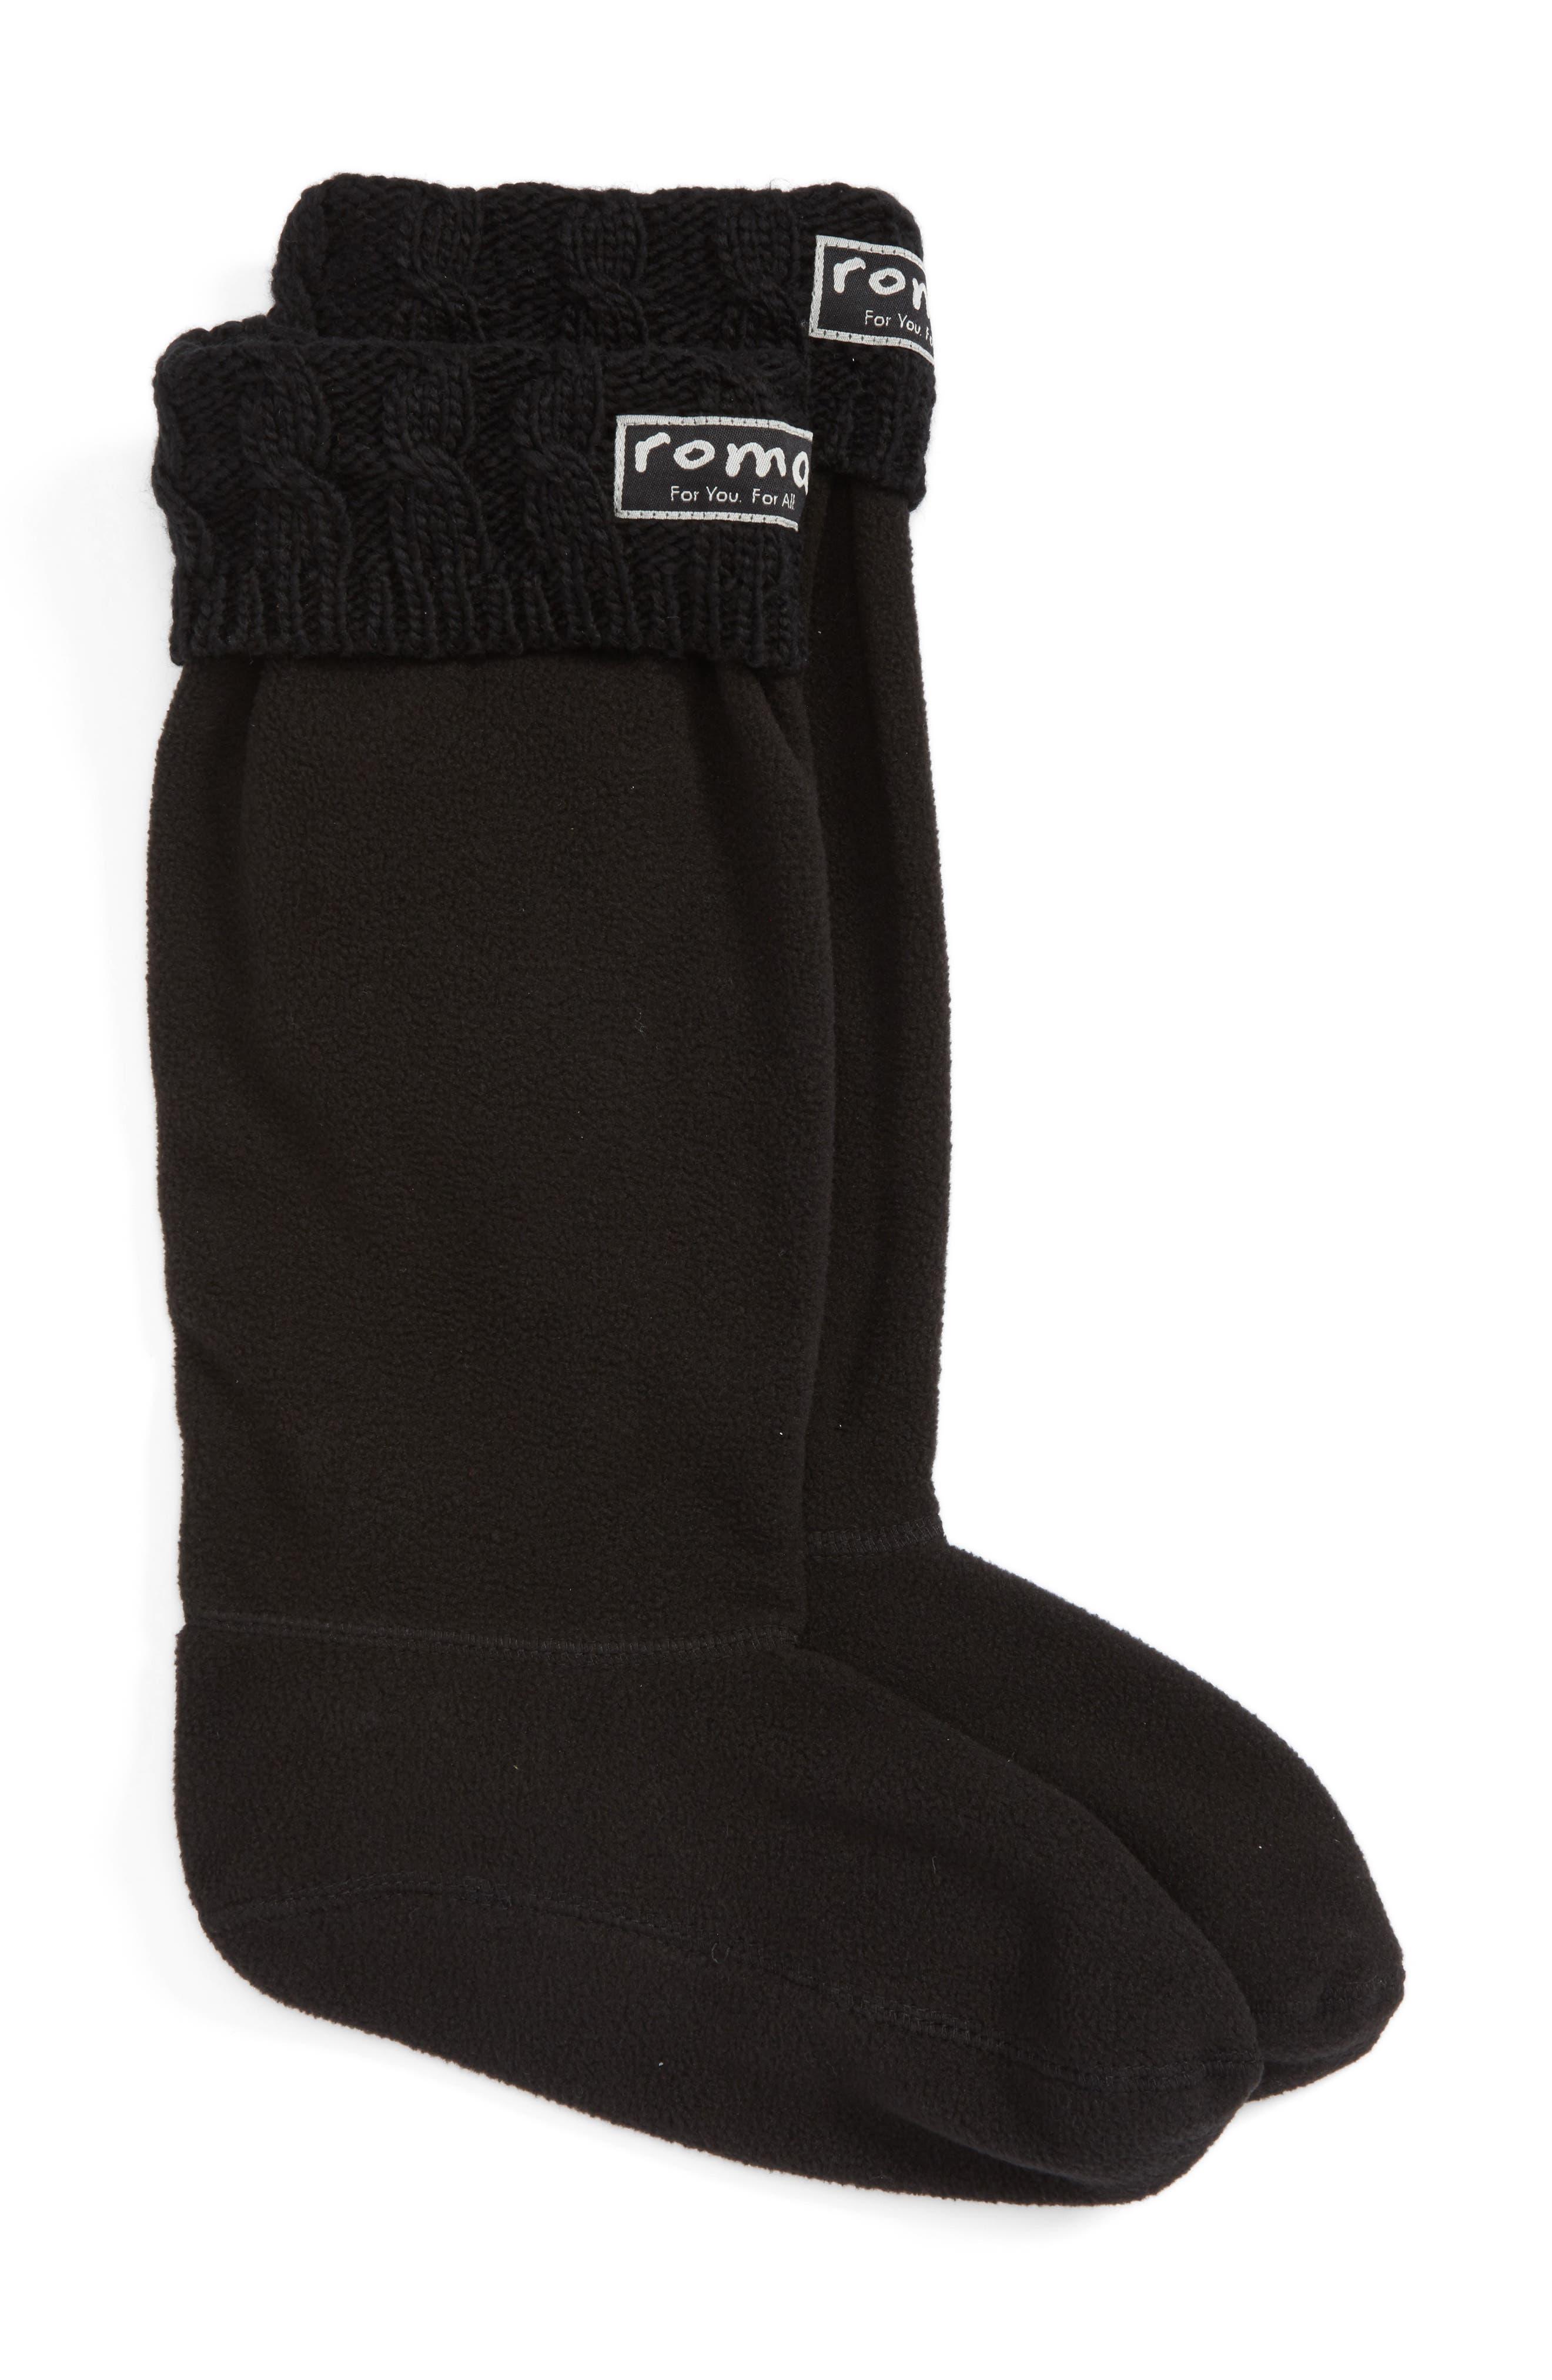 Knit Collar Fleece Boot Socks,                         Main,                         color, 002